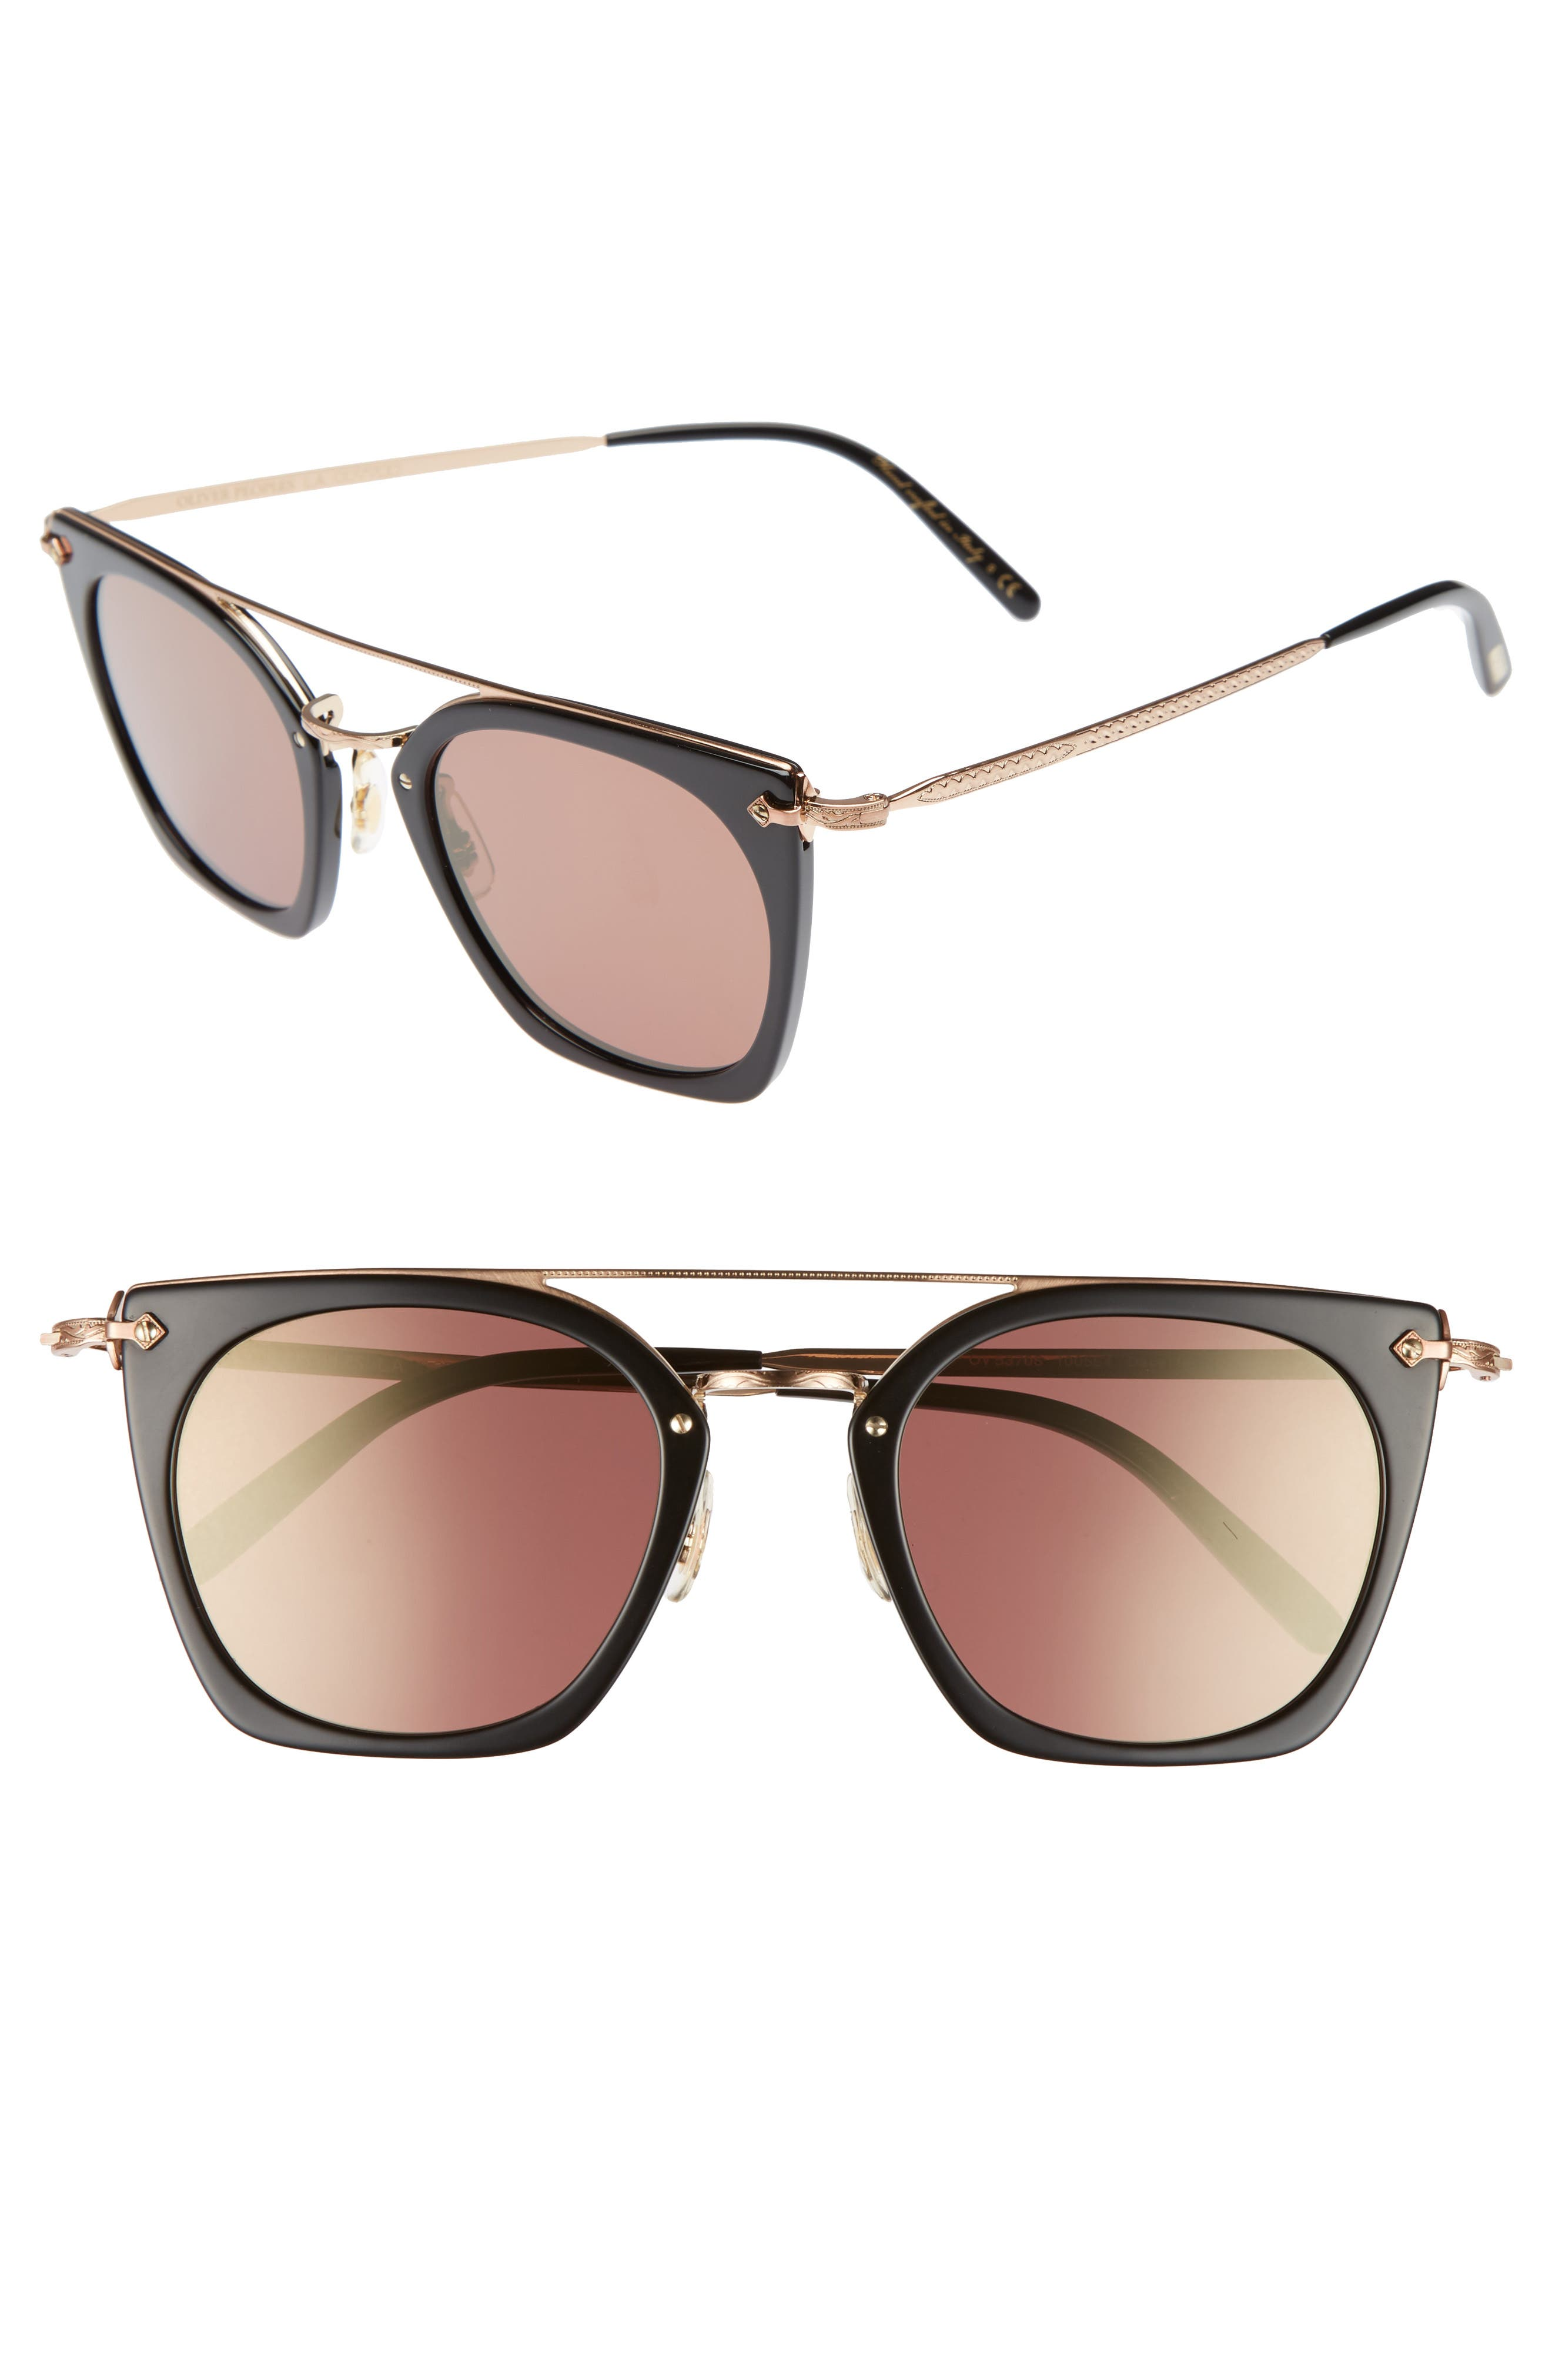 Dacette 50mm Square Aviator Sunglasses,                             Main thumbnail 1, color,                             BLACK/ ROSE GOLD